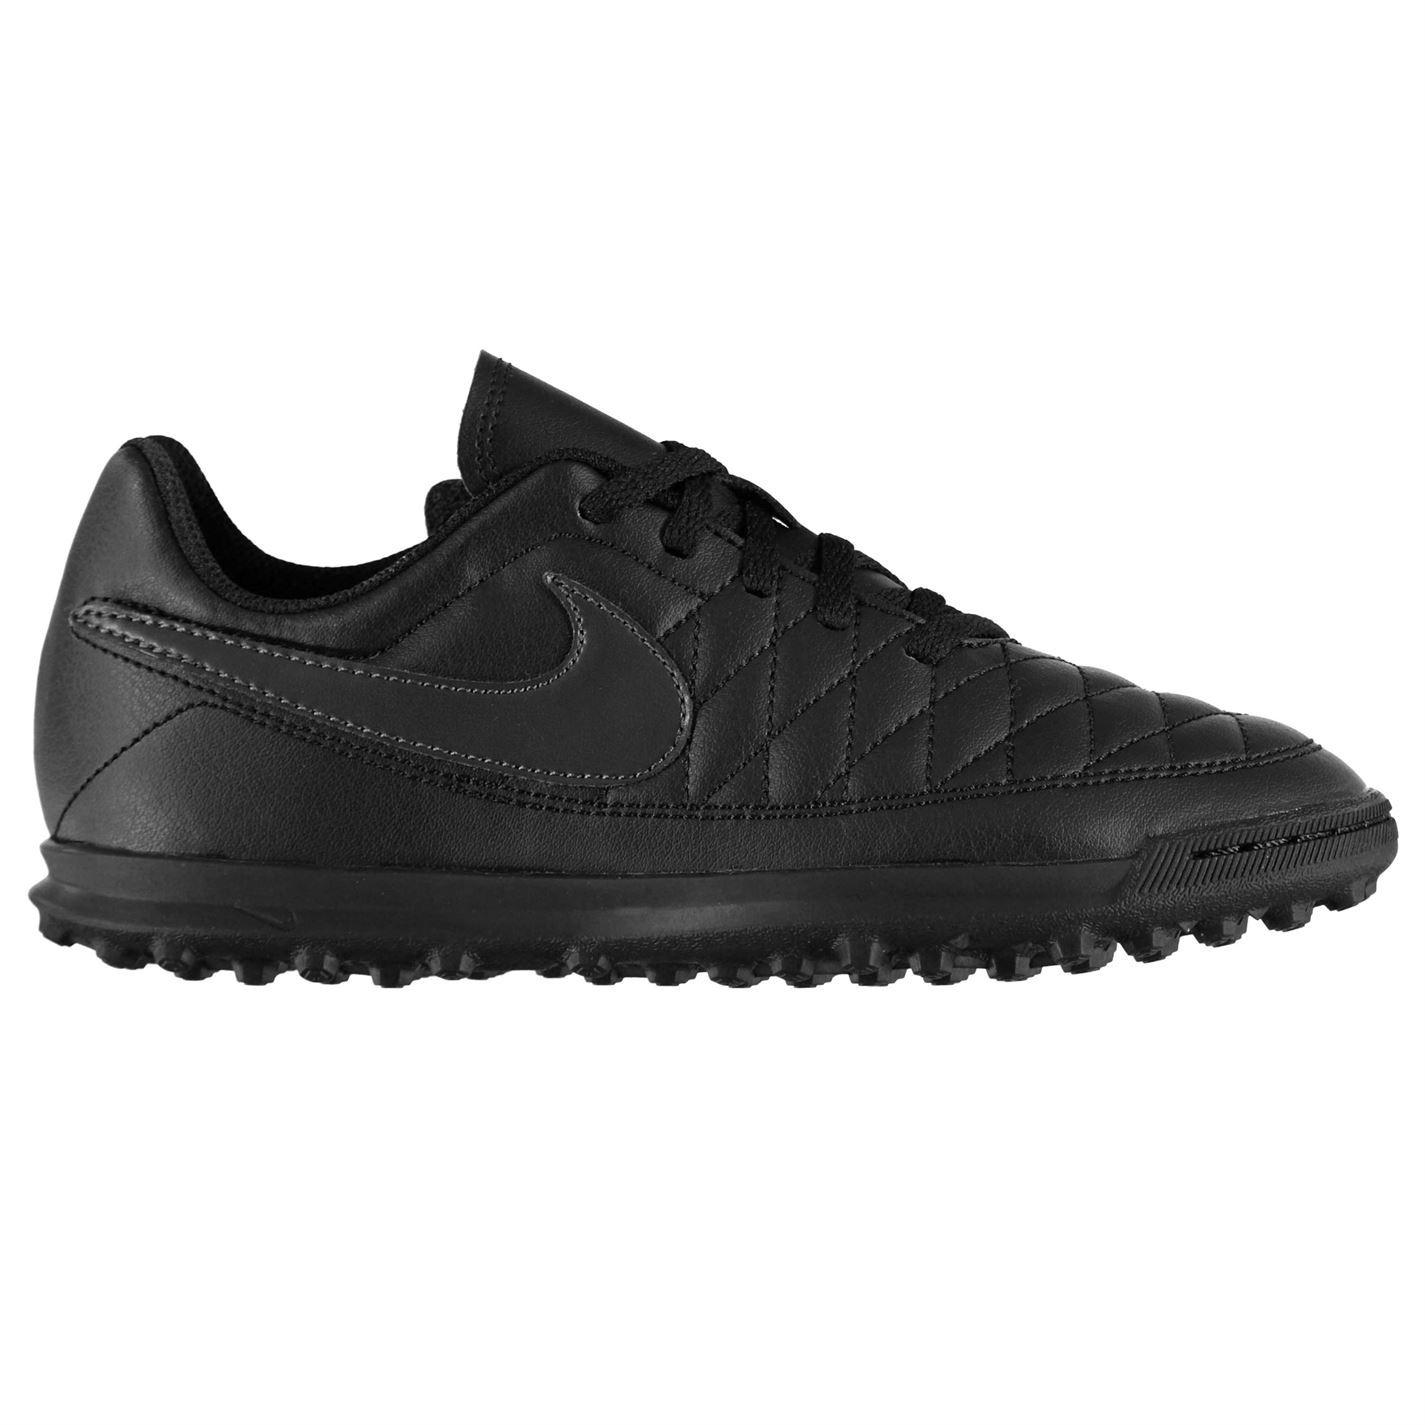 Nike-majestry-Astro-Turf-Football-Baskets-Juniors-Football-Baskets-Chaussures miniature 3